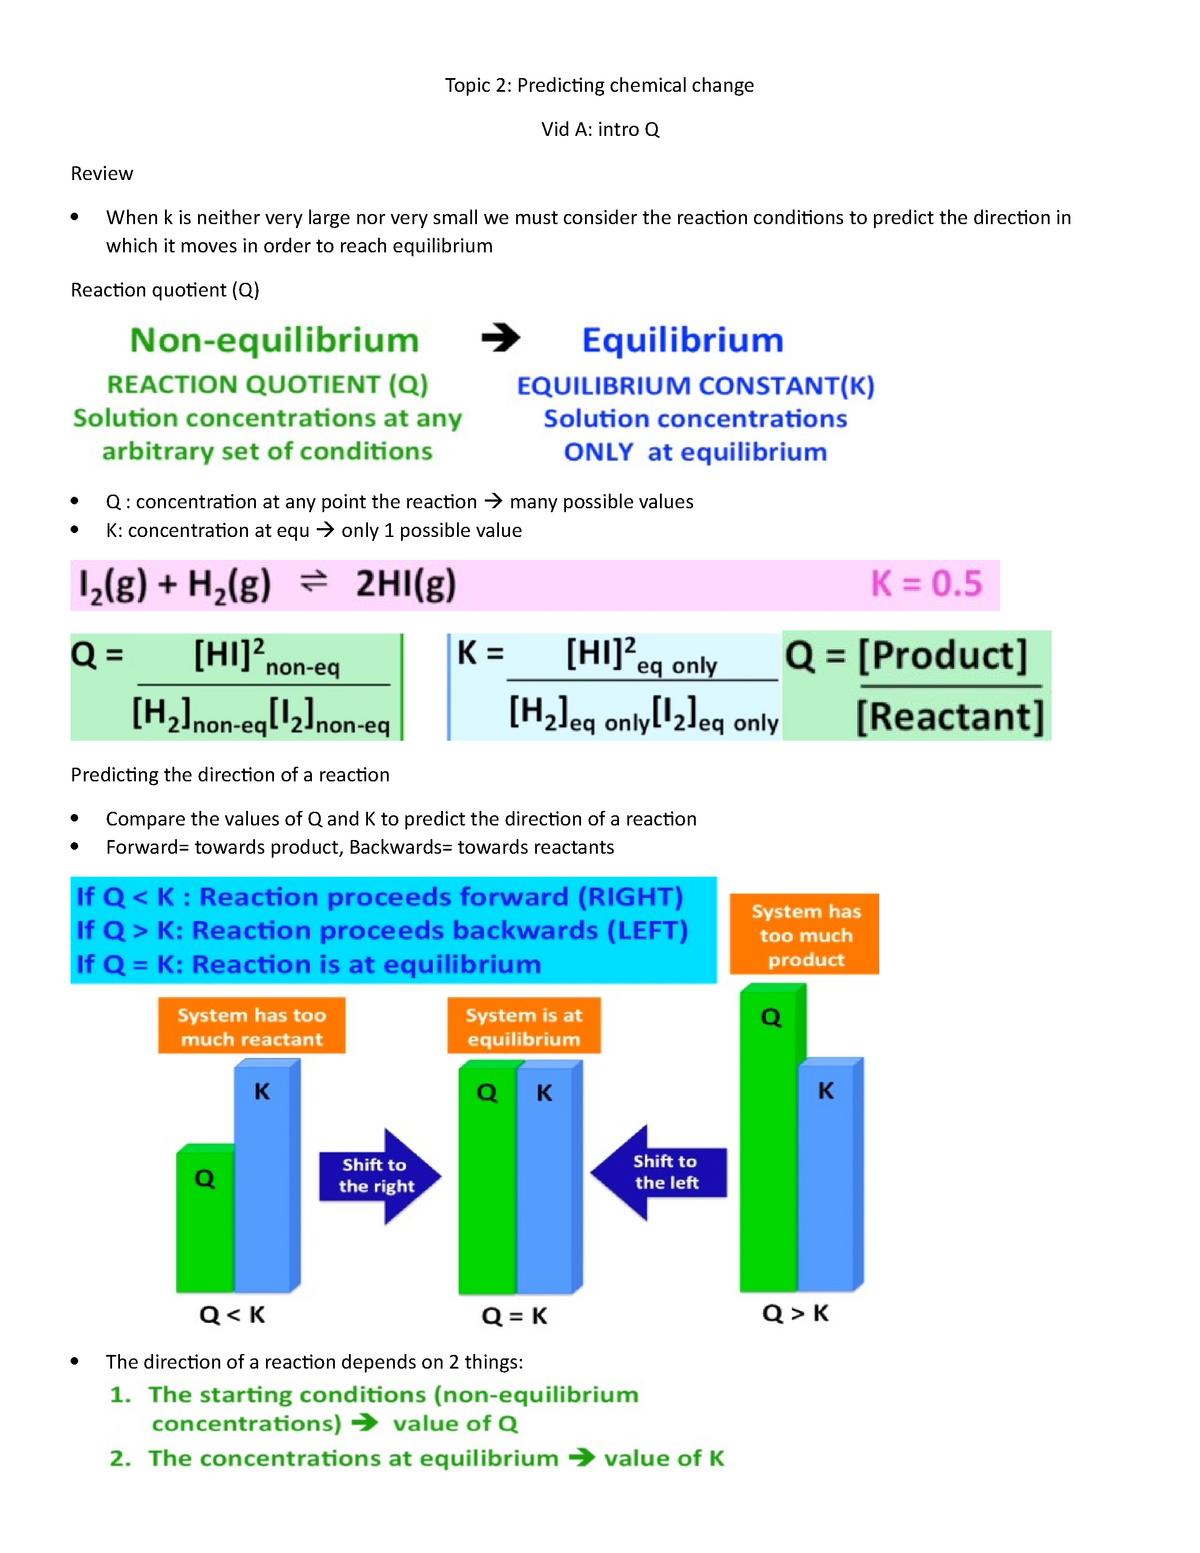 104-Topic 2 - predicting chemical change - CHEM 115 00